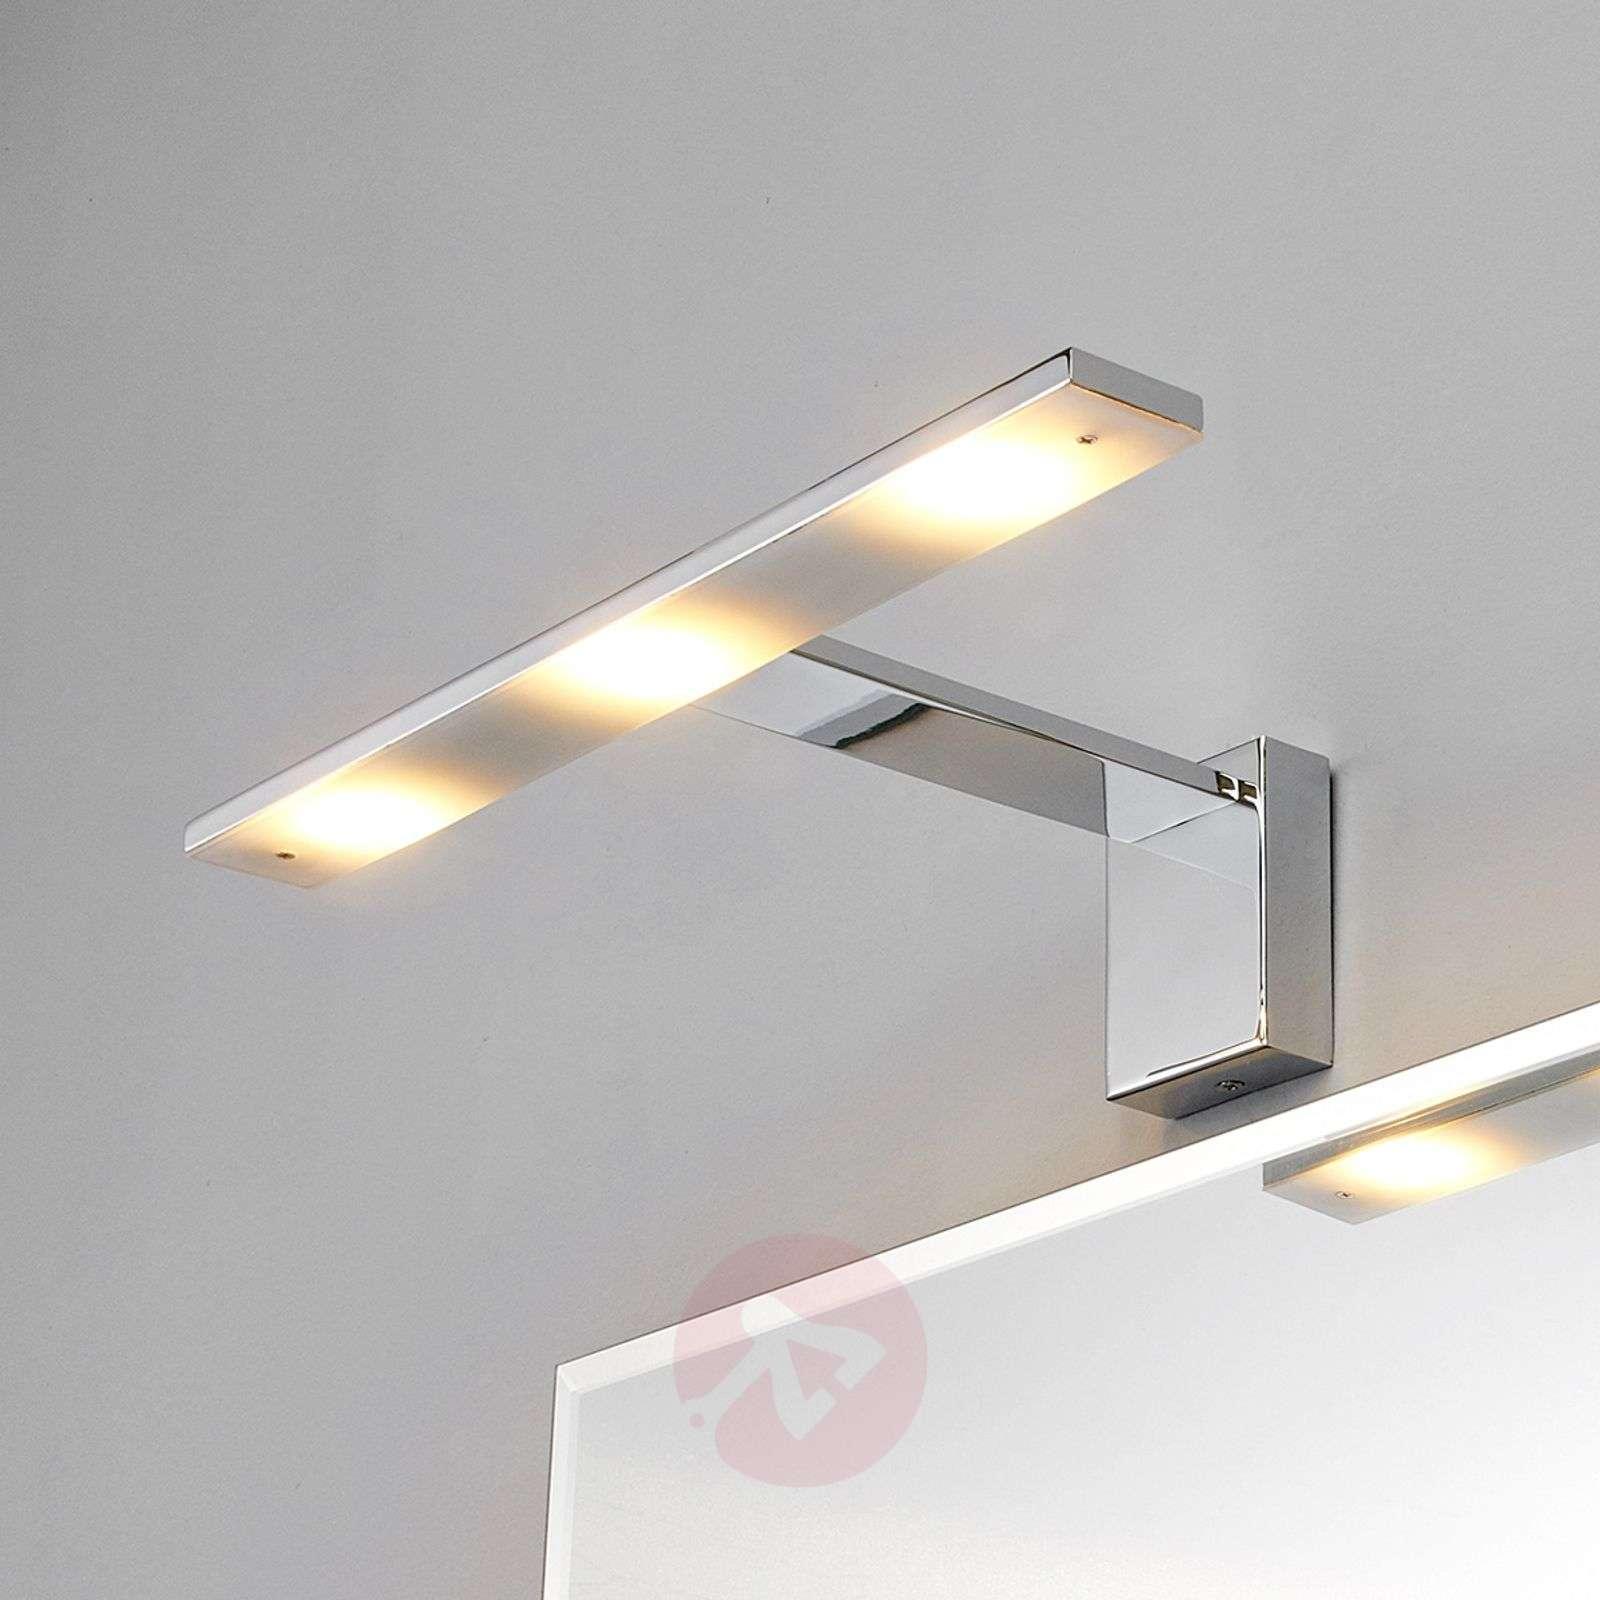 Tyylikäs LED-peilivalaisin Lorik, kromi